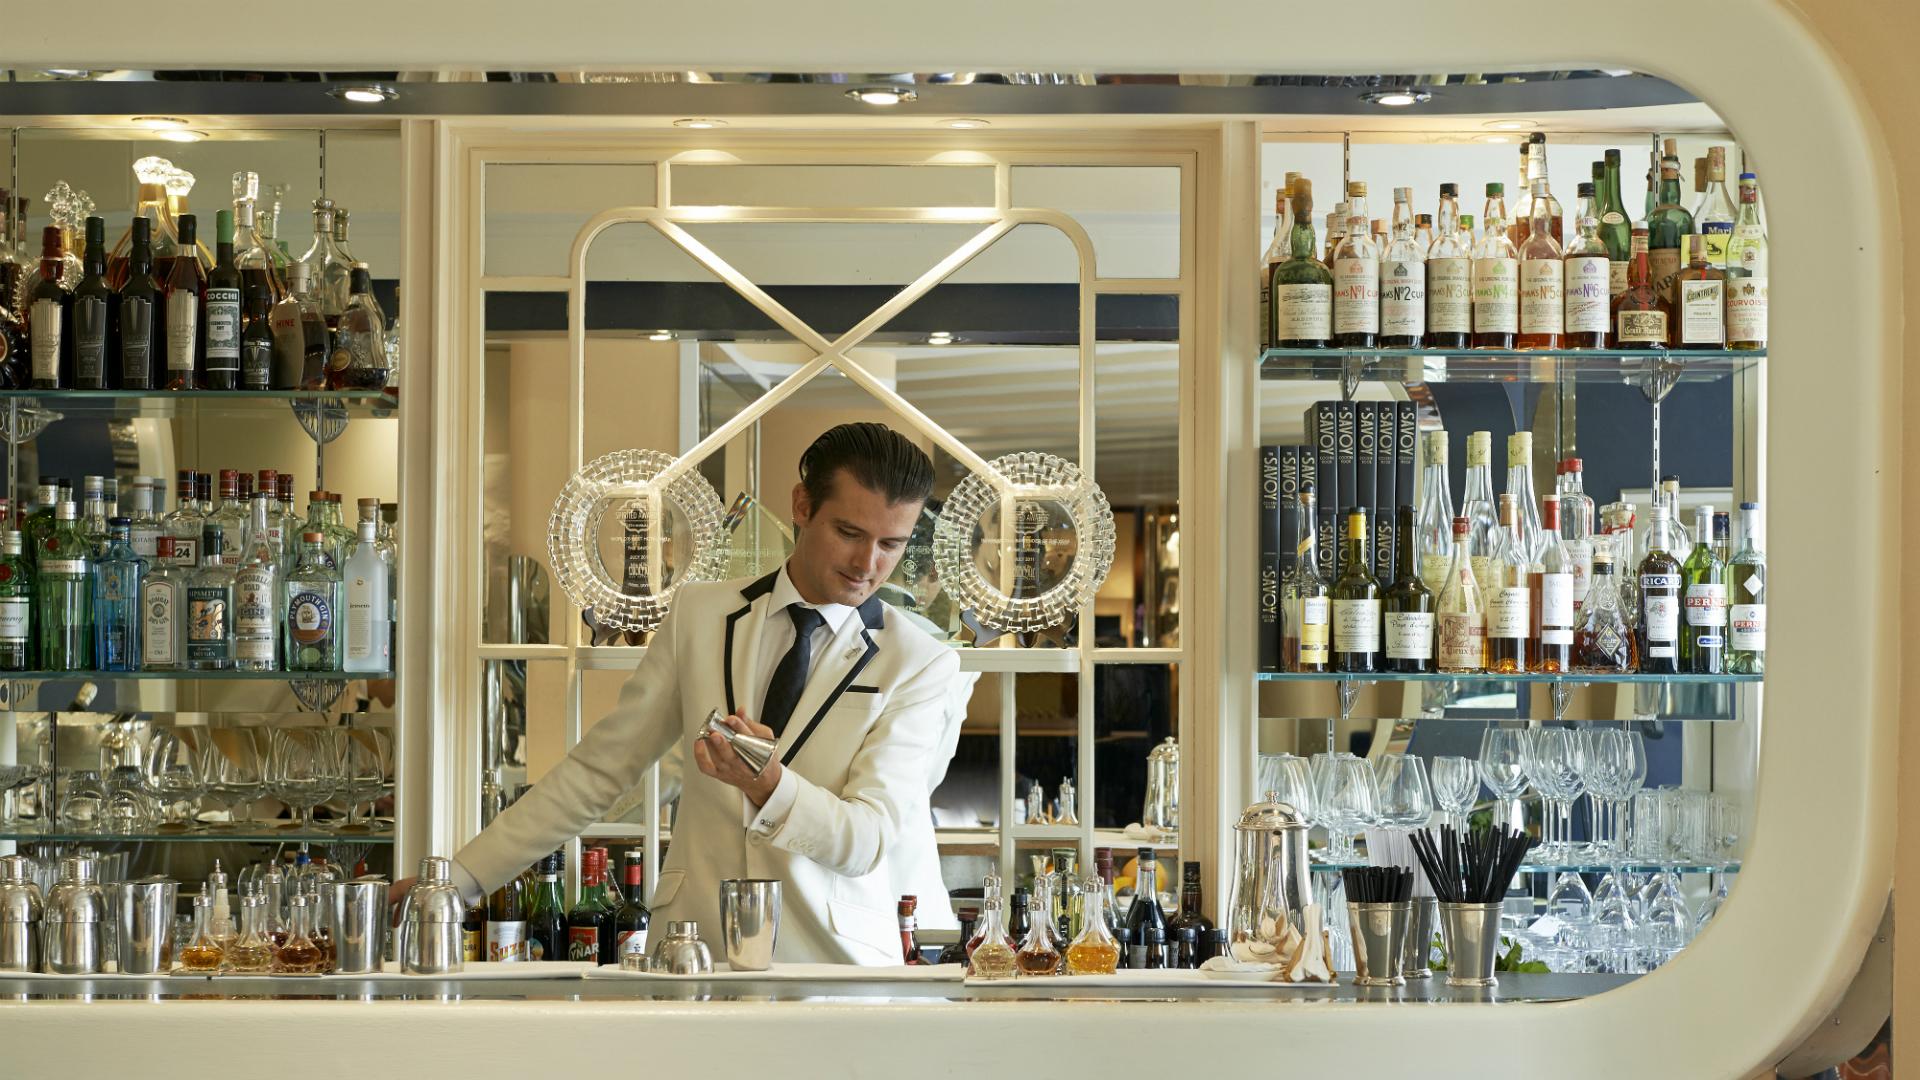 Bartender at the American Bar at The Savoy Hotel